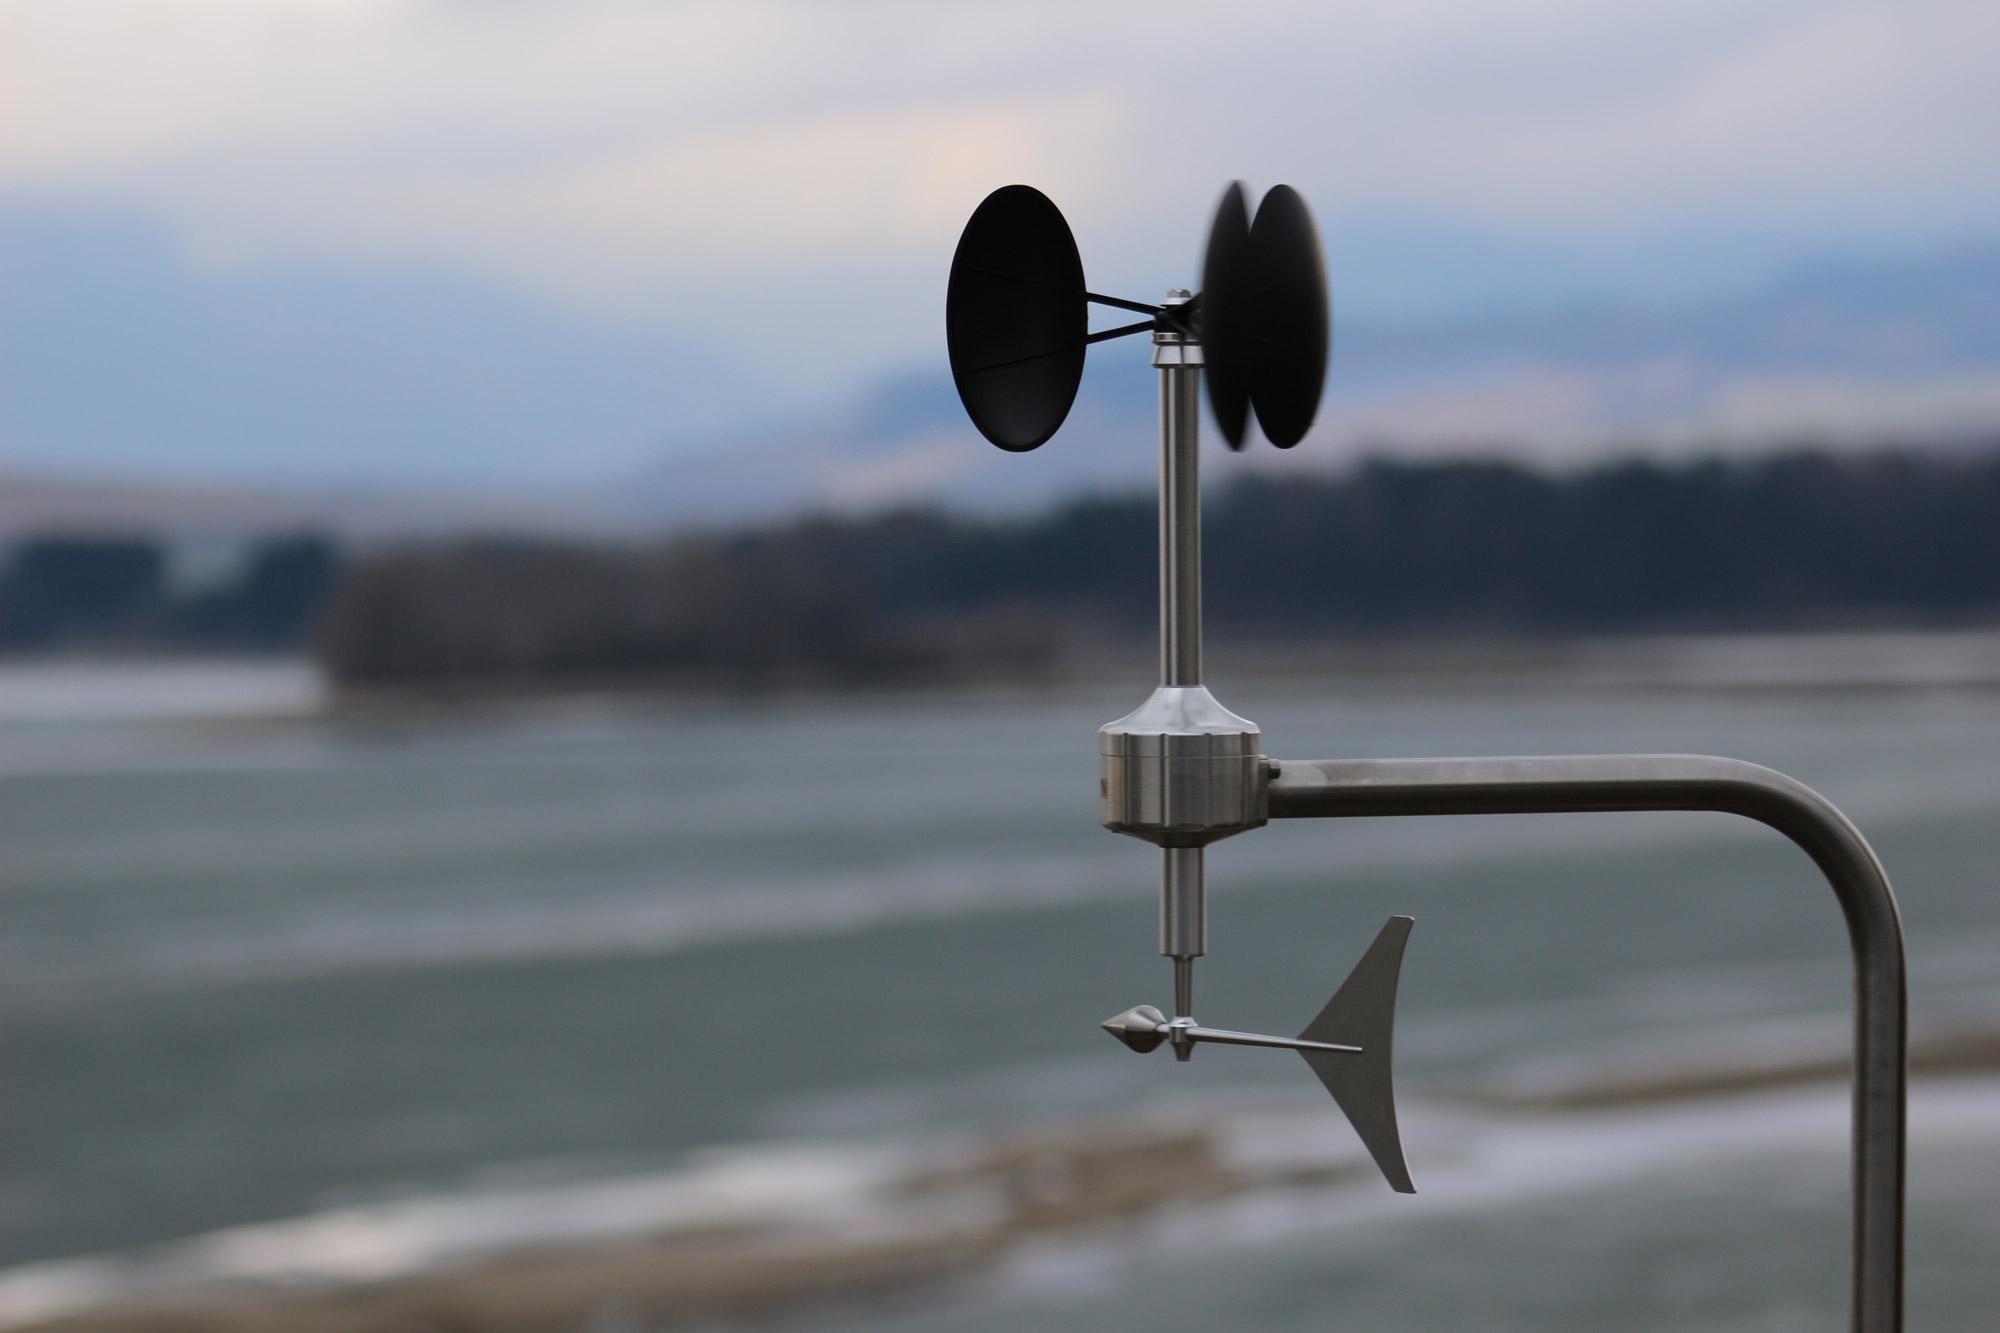 Anemometer on a lake